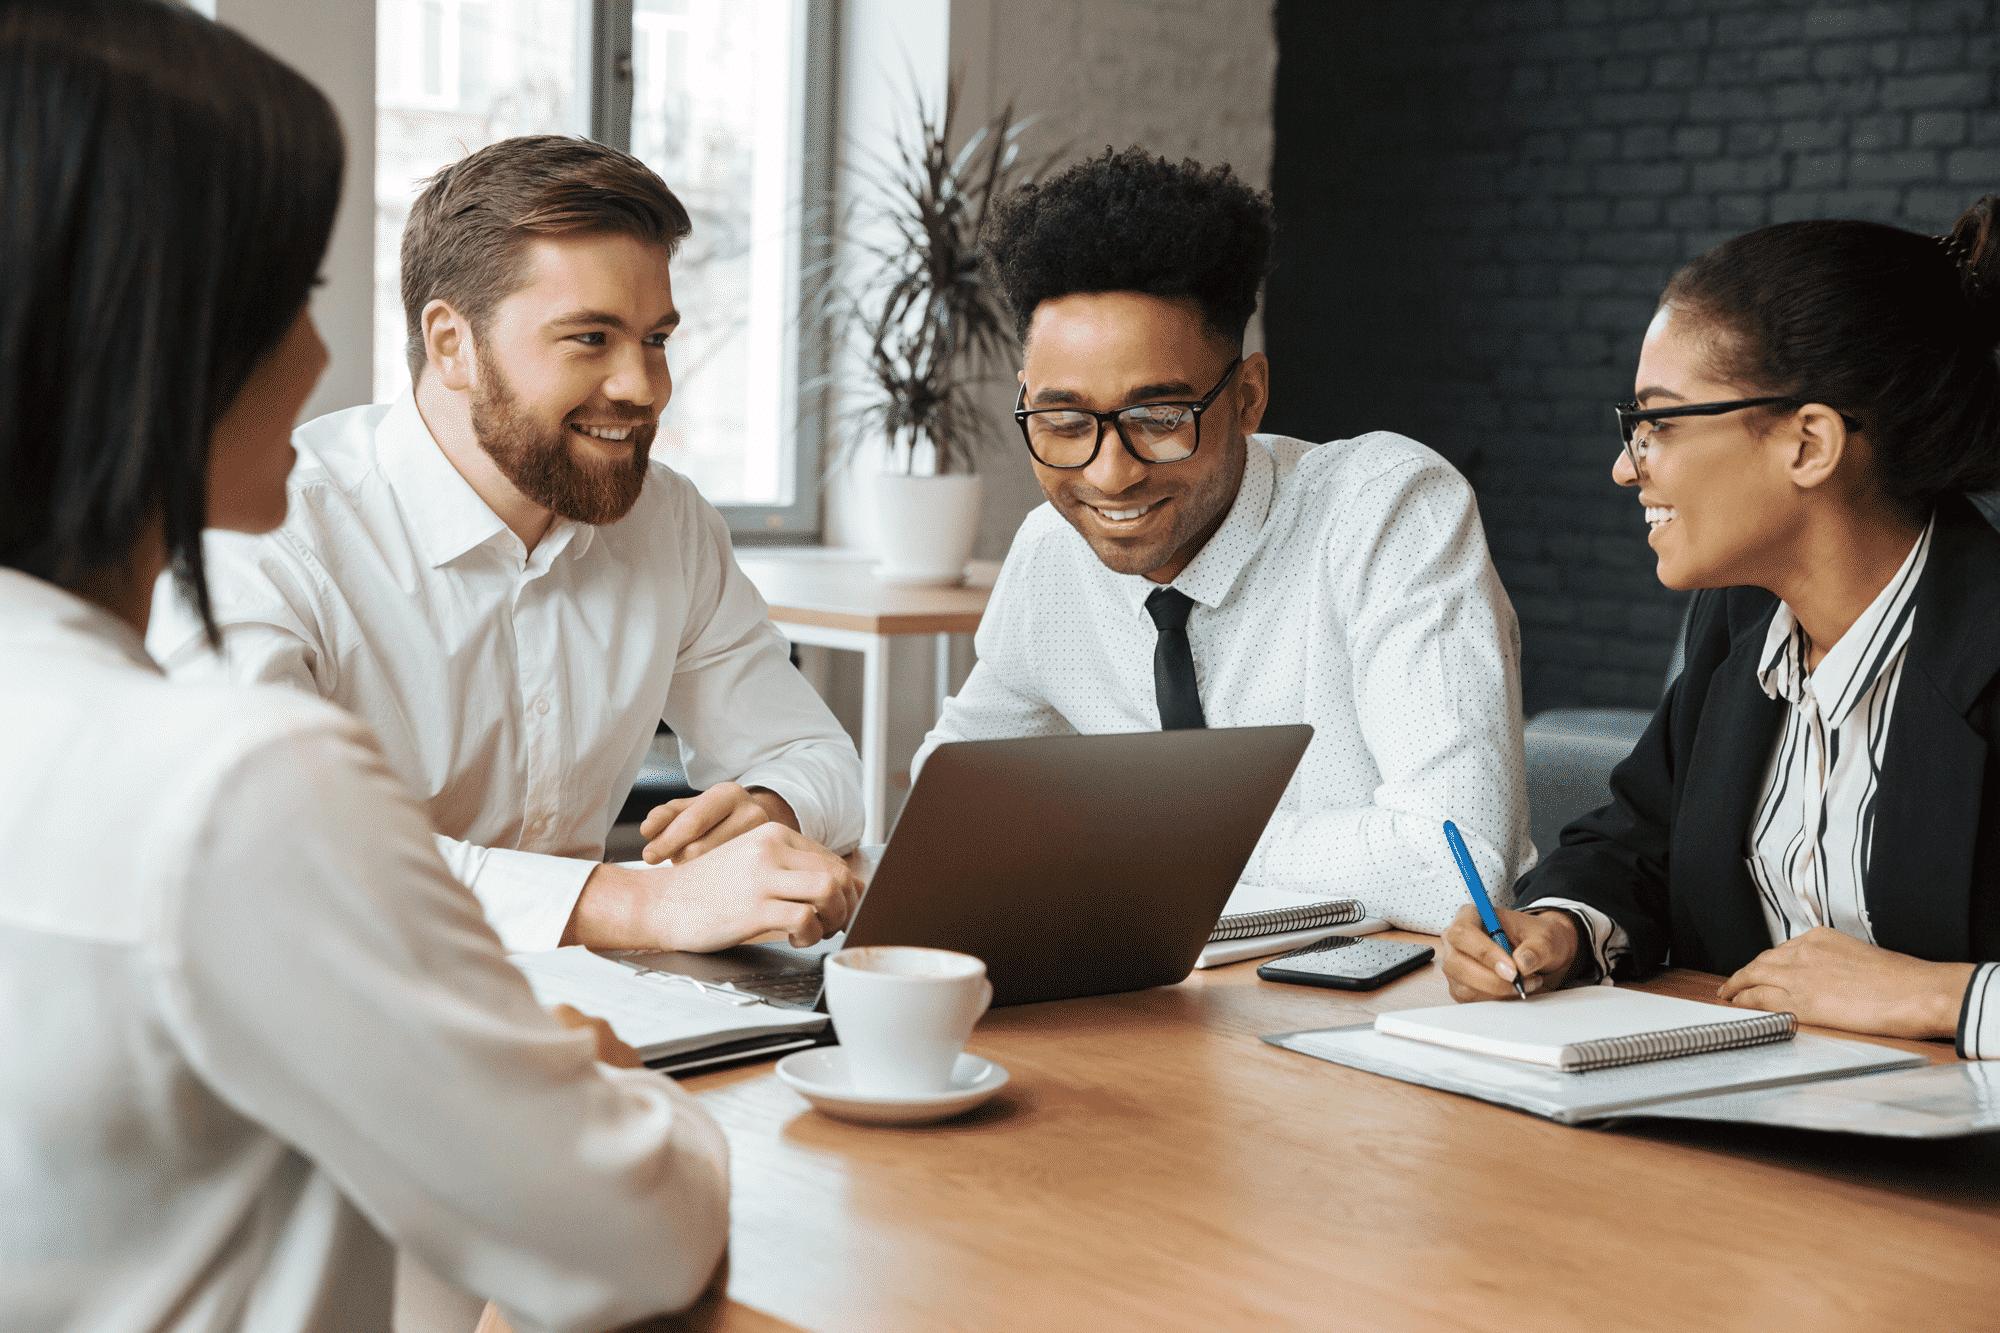 Verandermanager | Change manager | Interim | 100% datagedreven